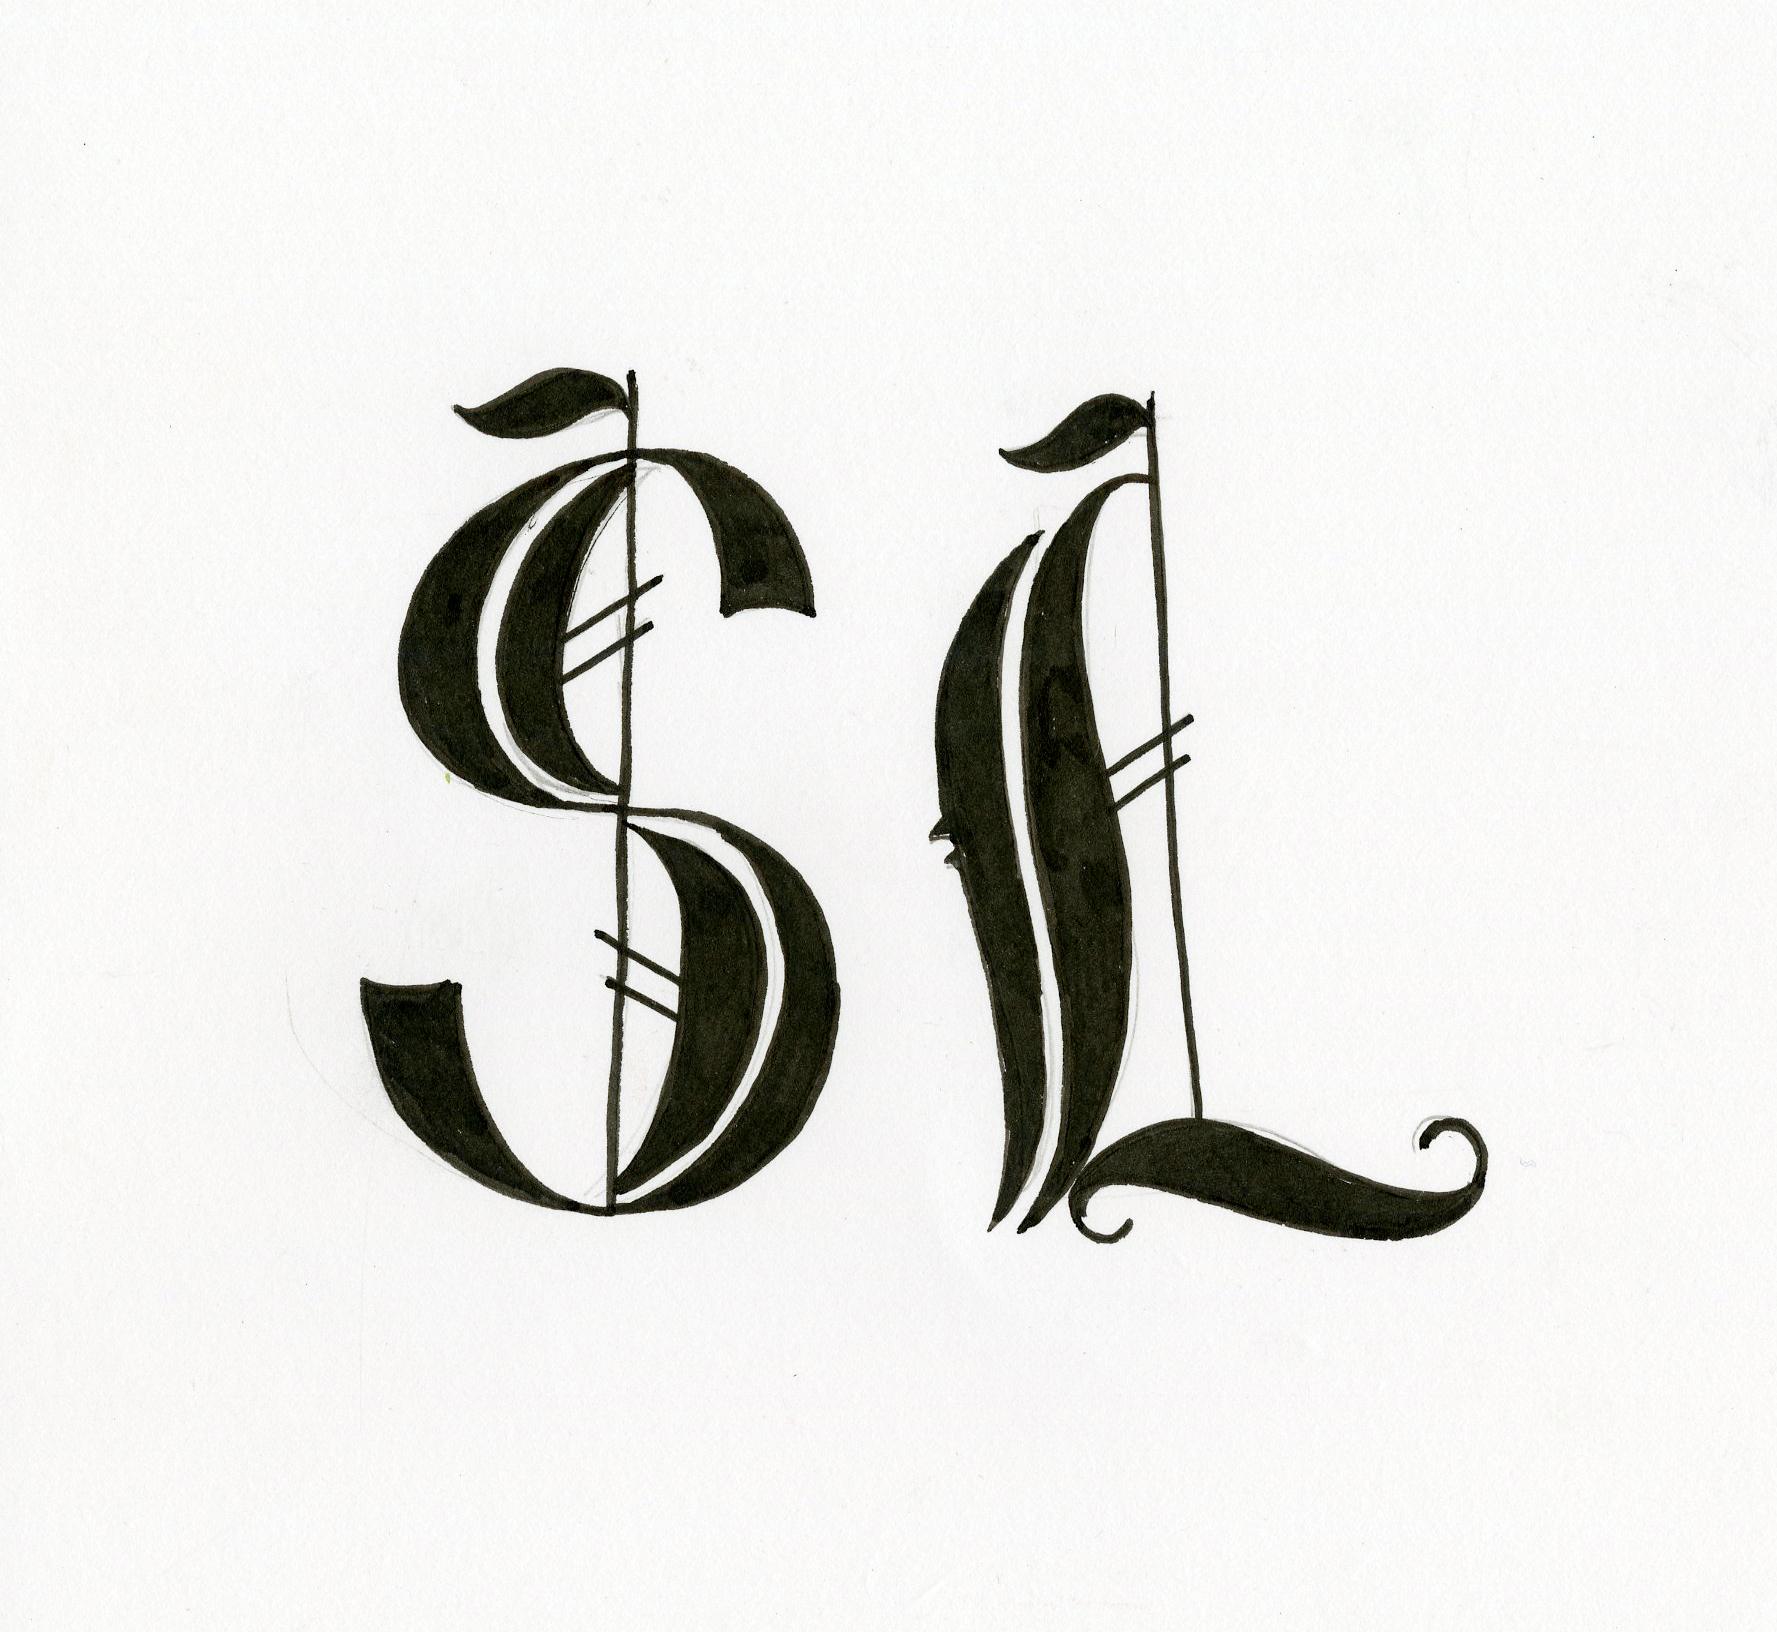 Shannon L. - SL